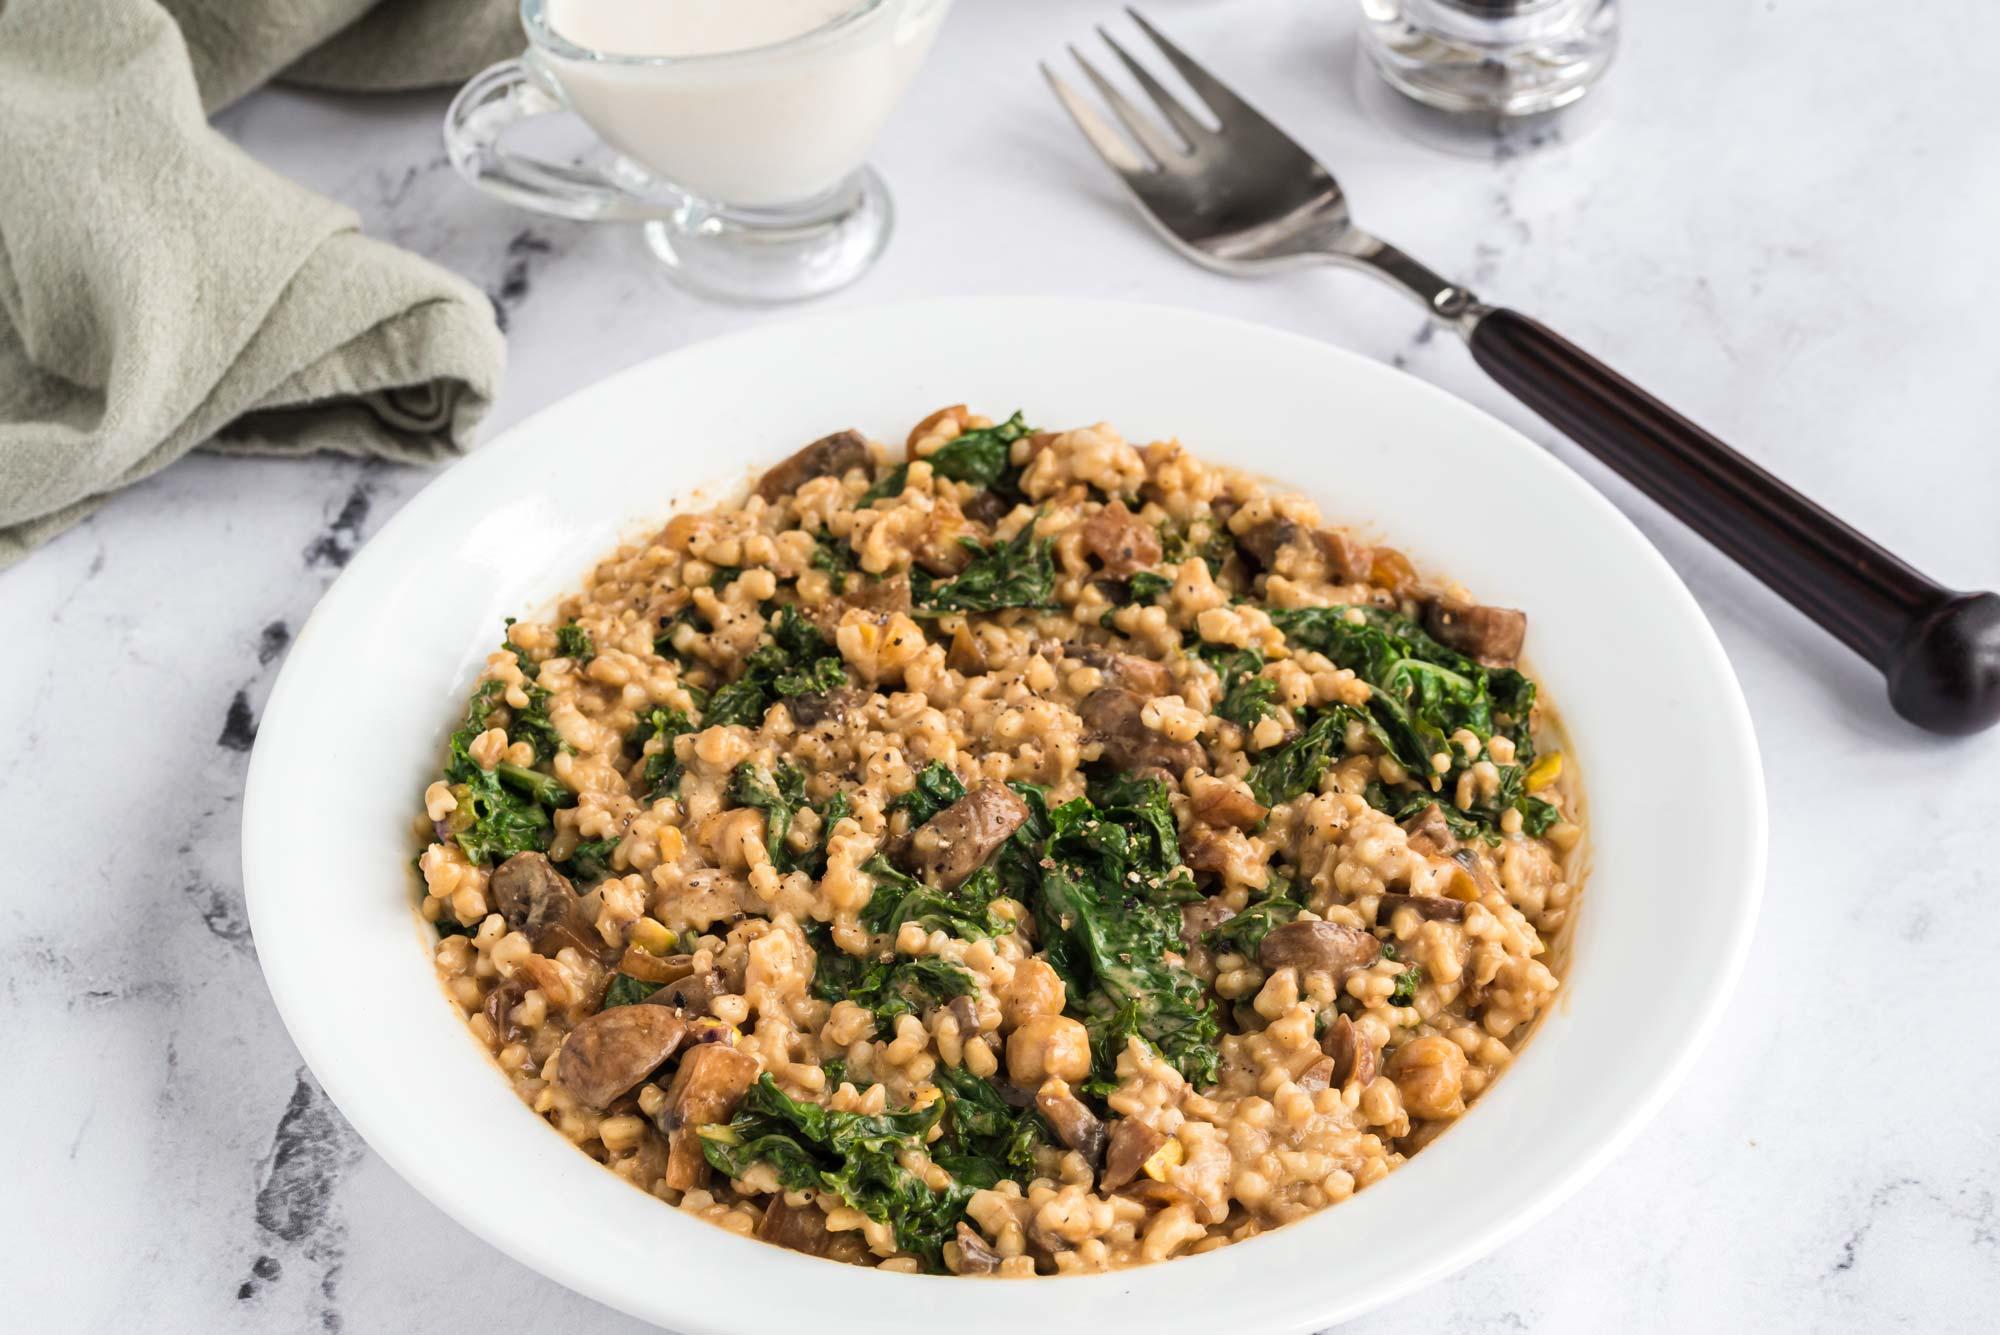 kale and mushroom oat groats in bowl